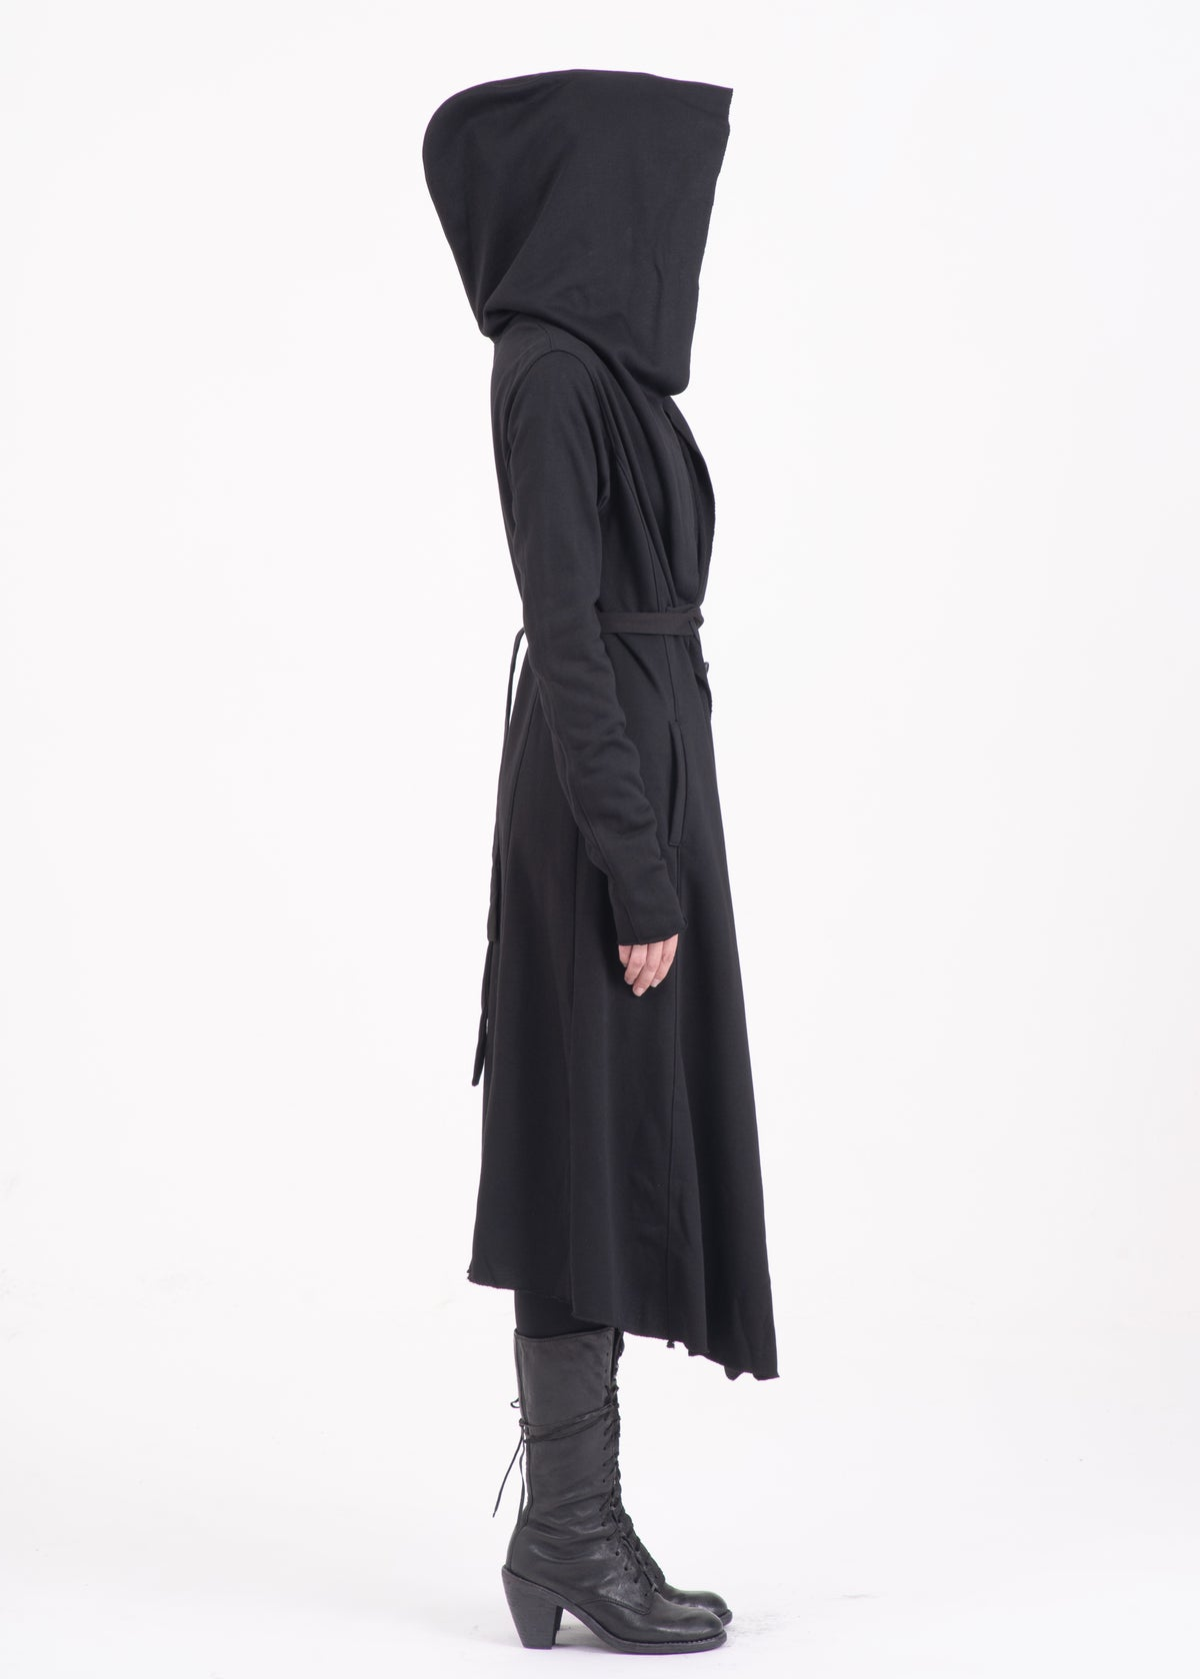 Image of Lace Up Hooded Jacket